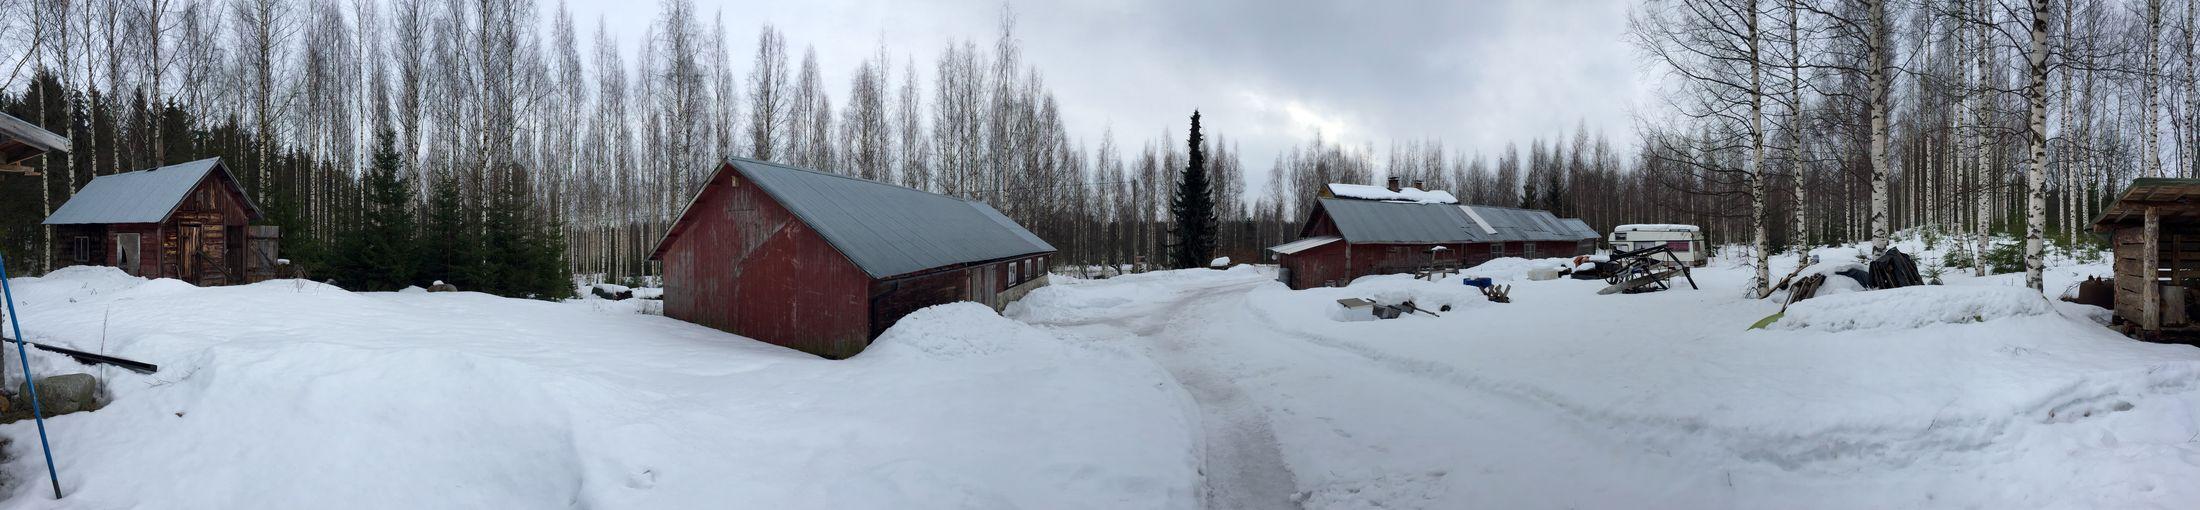 Snow everywhere ❄️ 360° Finland Nice View